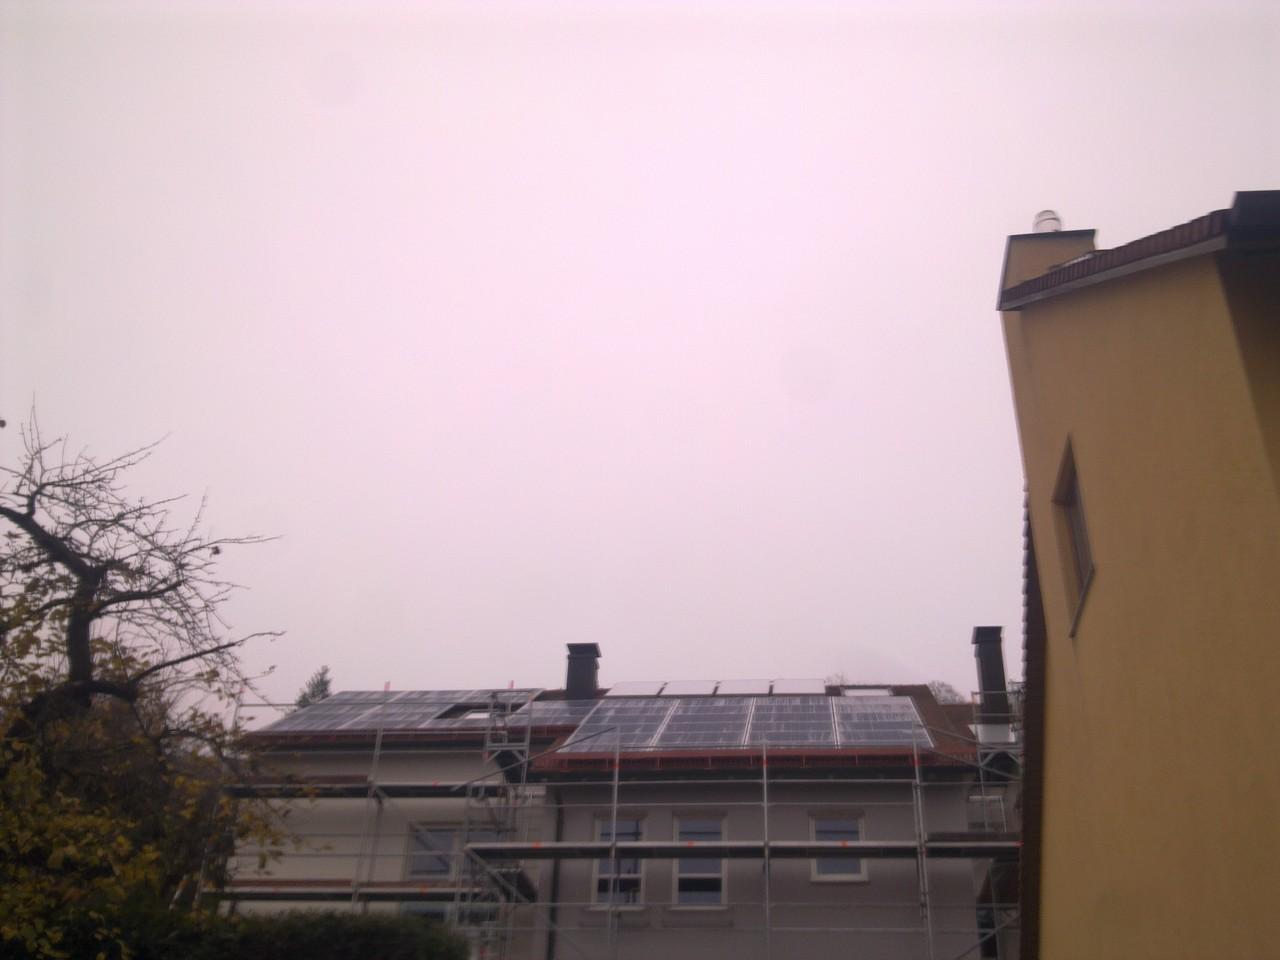 16 kWp Photovotaik Anlage in 93053 Regensburg